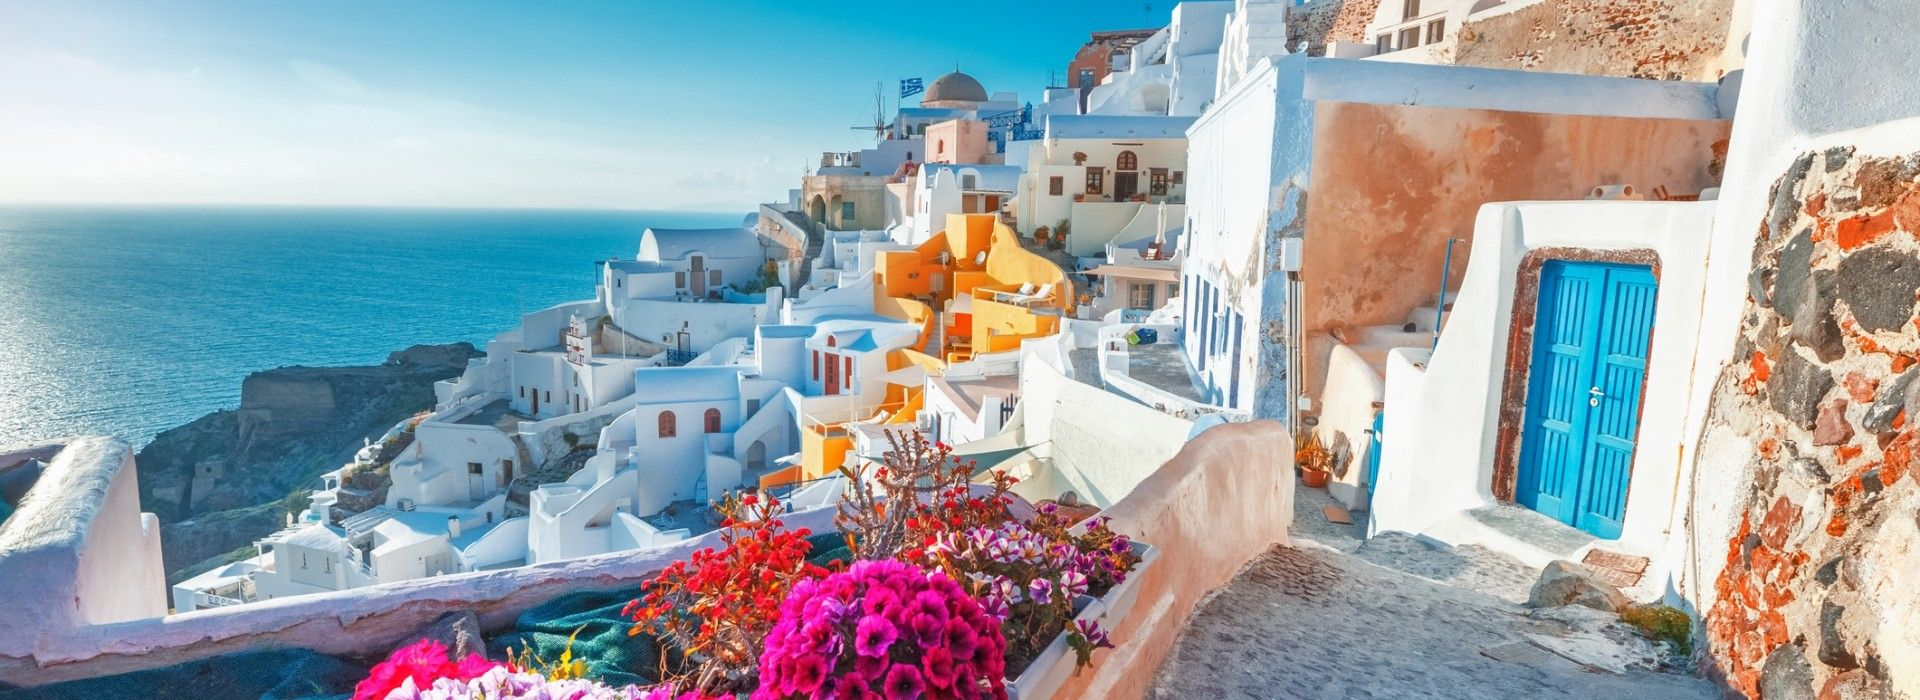 Local boat rides Tours in Mediterranean